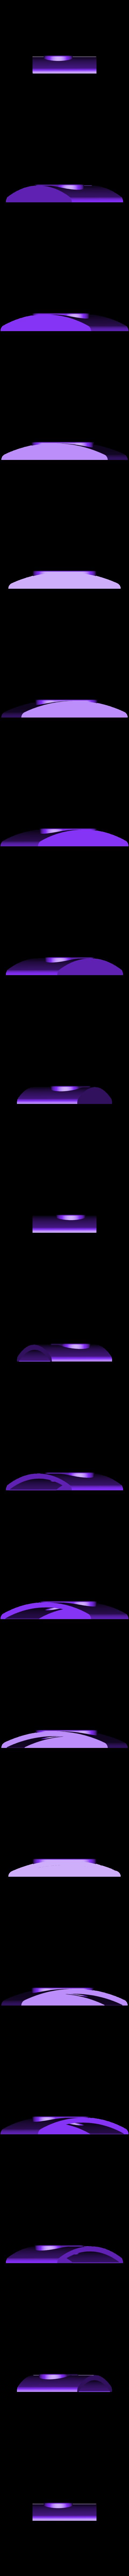 Sandbox_3-SCALED-B.STL Download free STL file 4-8-8-4 Big Boy Locomotive • 3D printer object, RaymondDeLuca